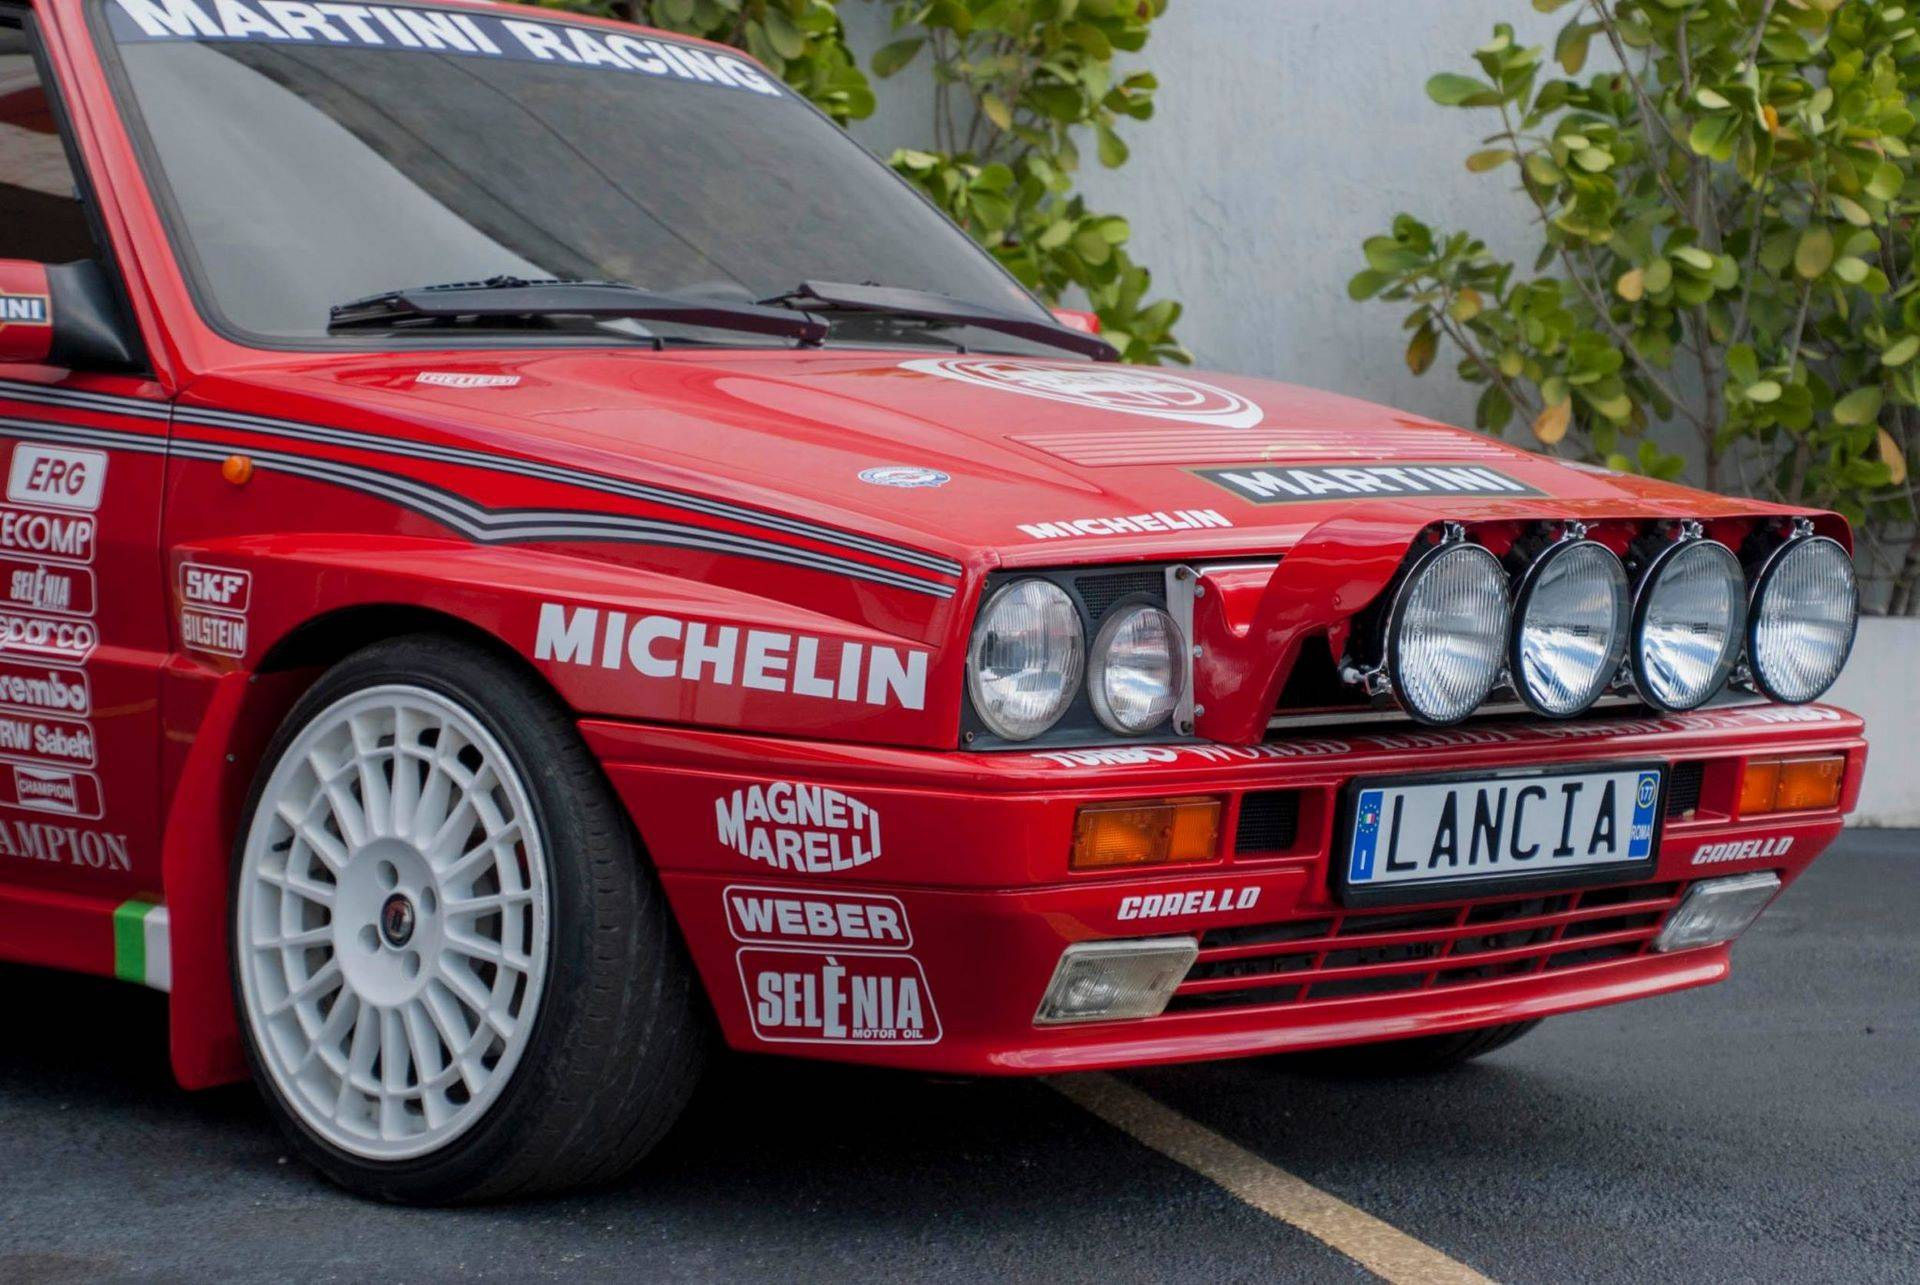 Lancia-Delta-Integrale-8V-1989-4